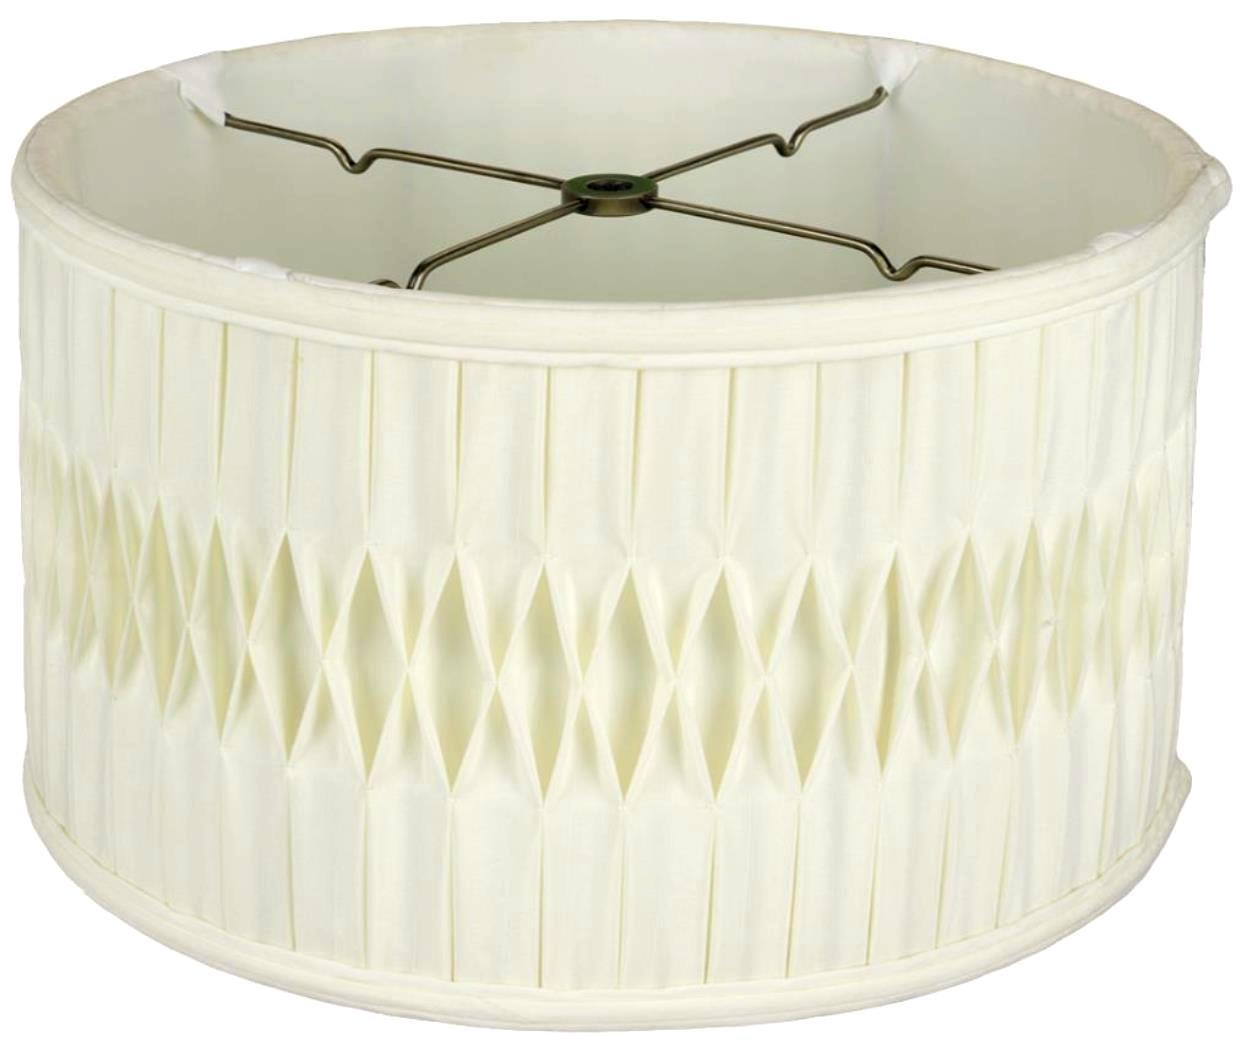 "Smock Pleated Silk Shallow Drum Lamp Shade Cream, White 12-18""W"